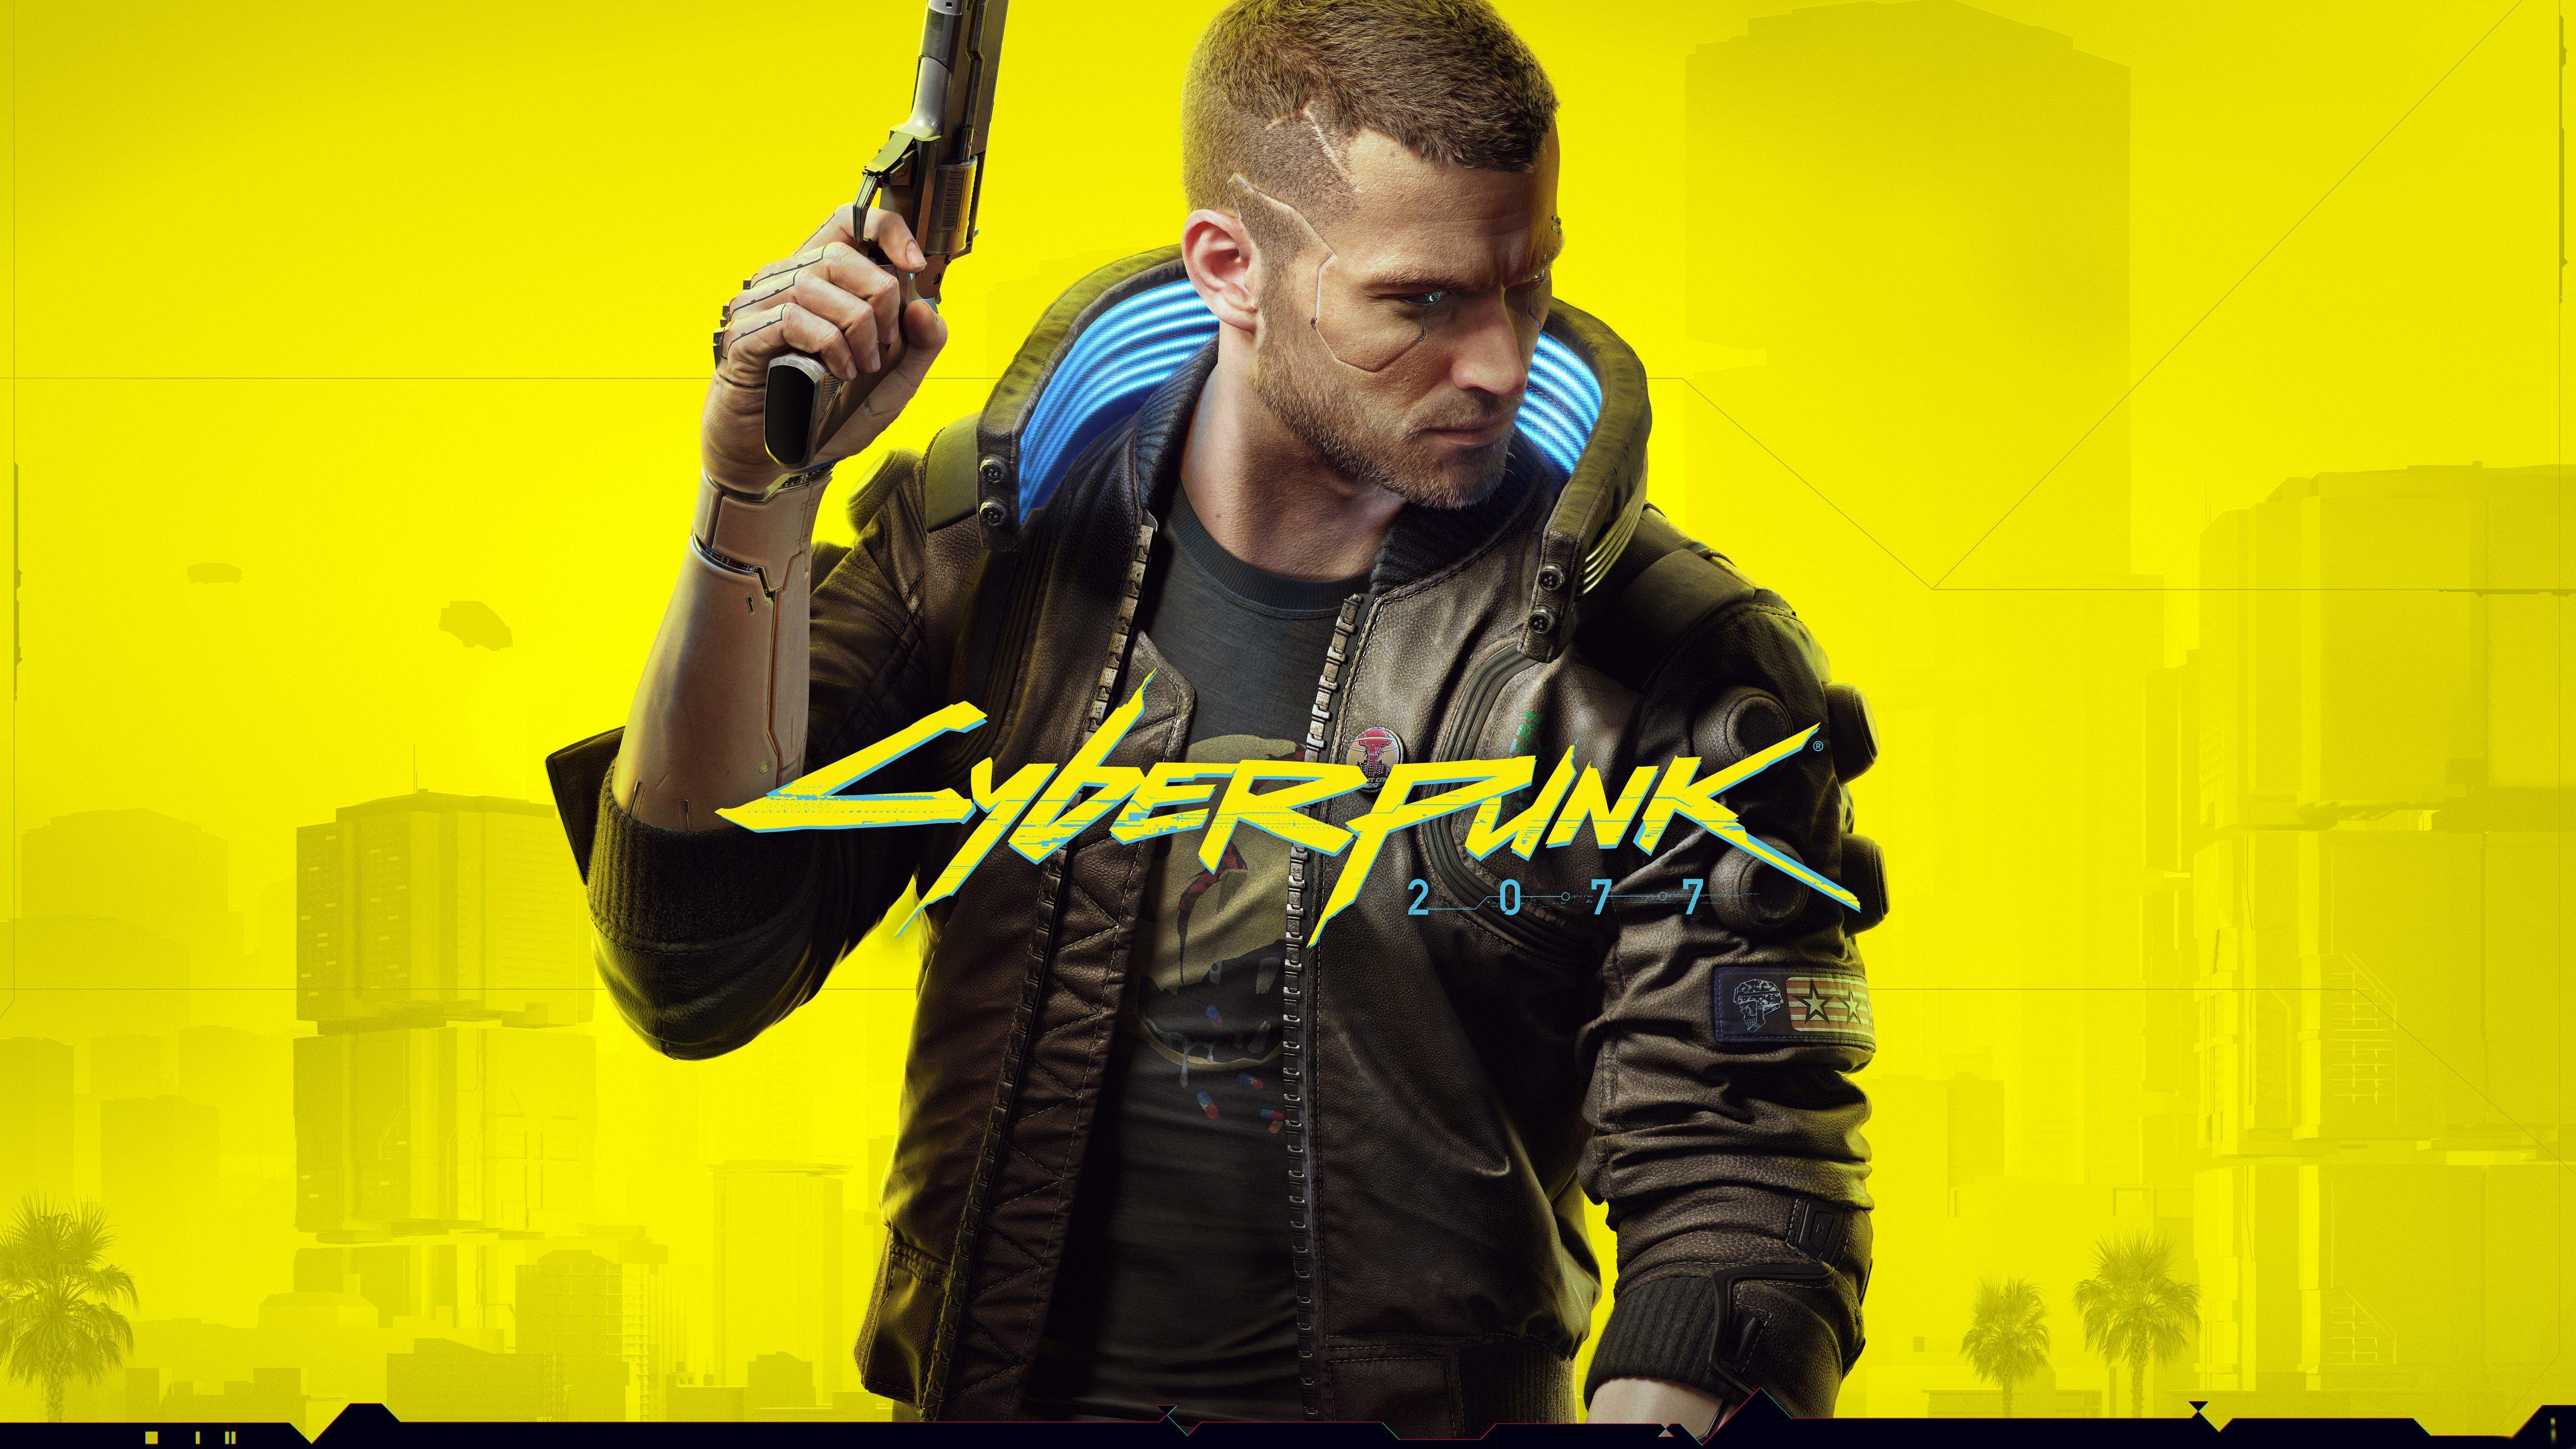 Fondos de pantalla Cyberpunk 2077